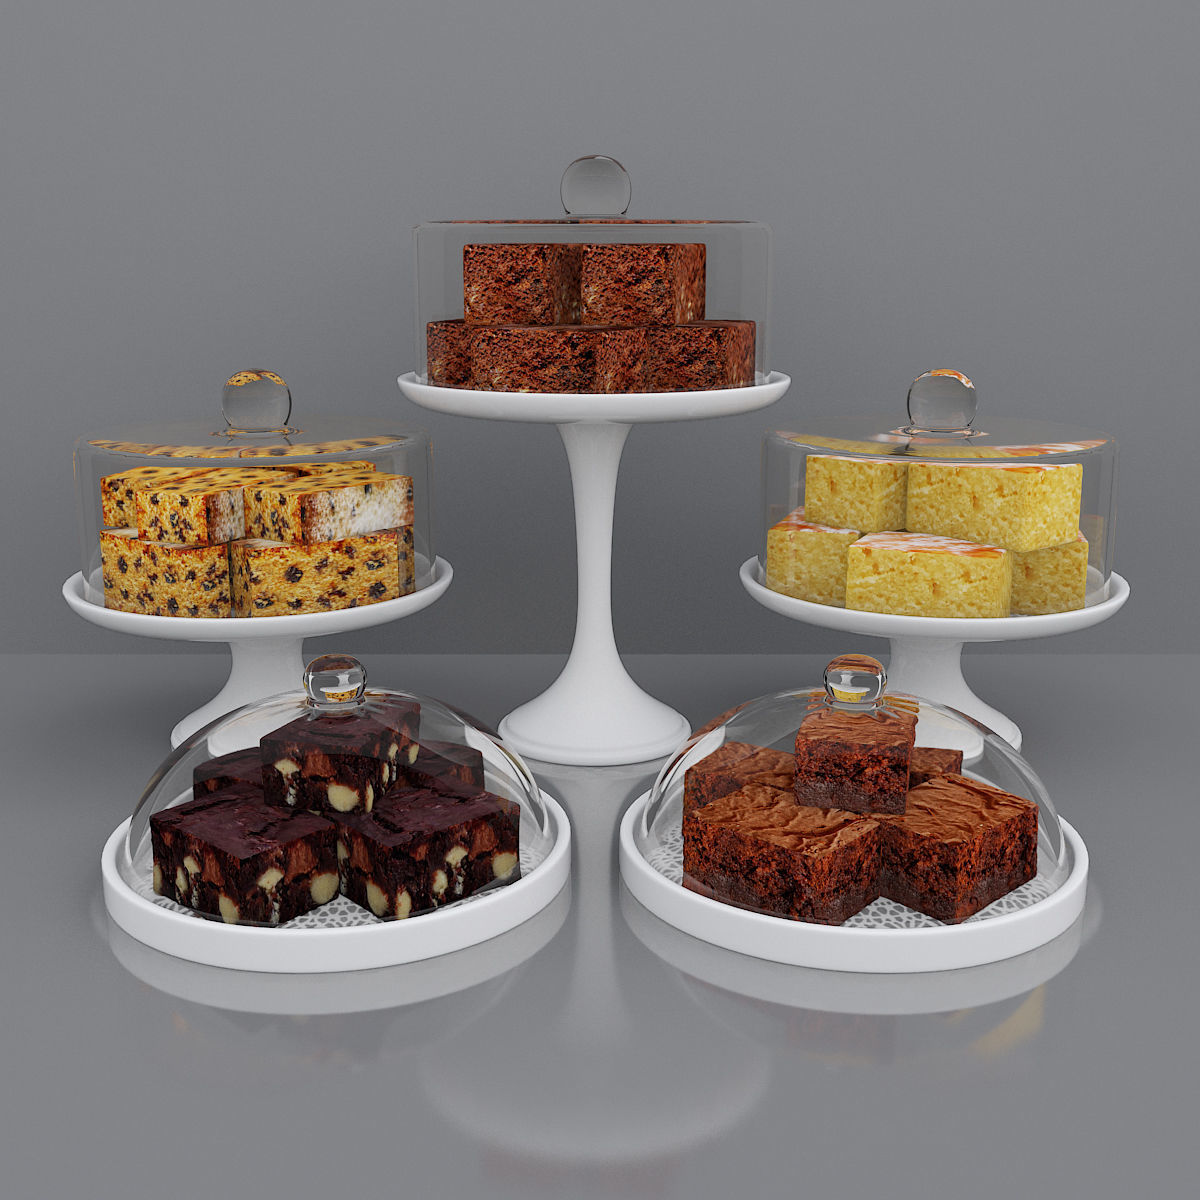 Brownies and cake bars